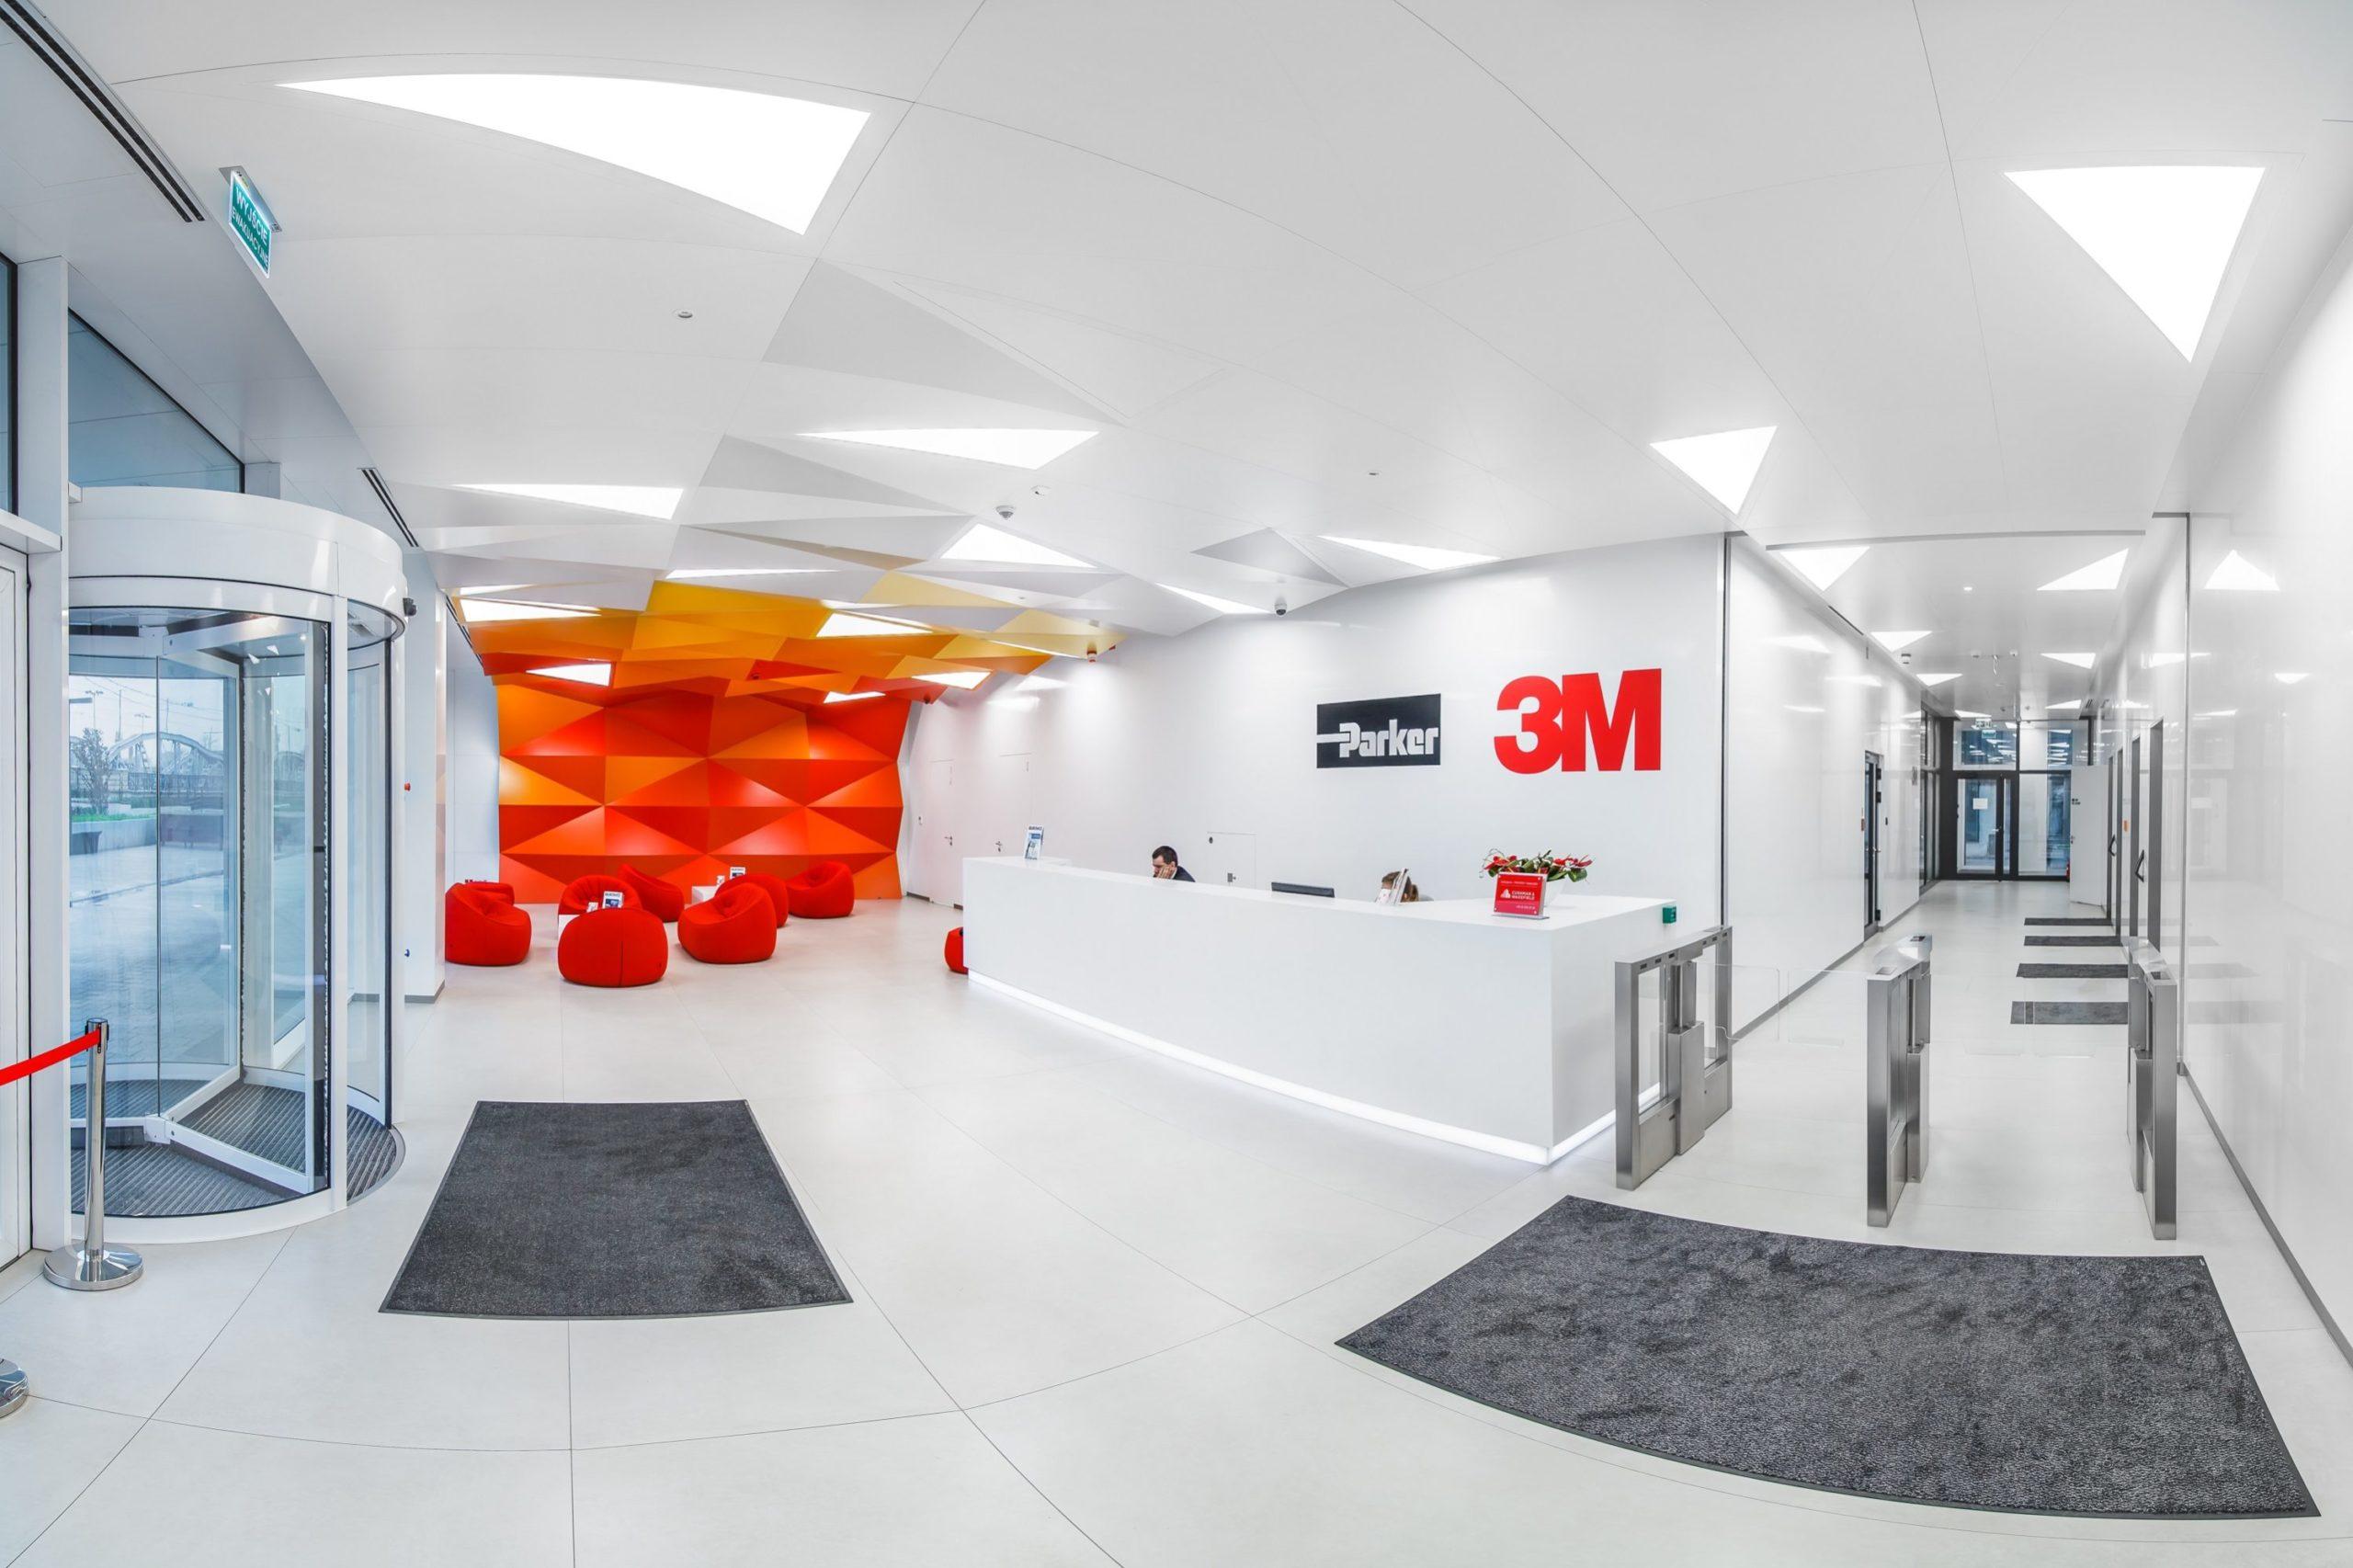 Oprawy biurowe w biurowcu 3M - Luxon LED